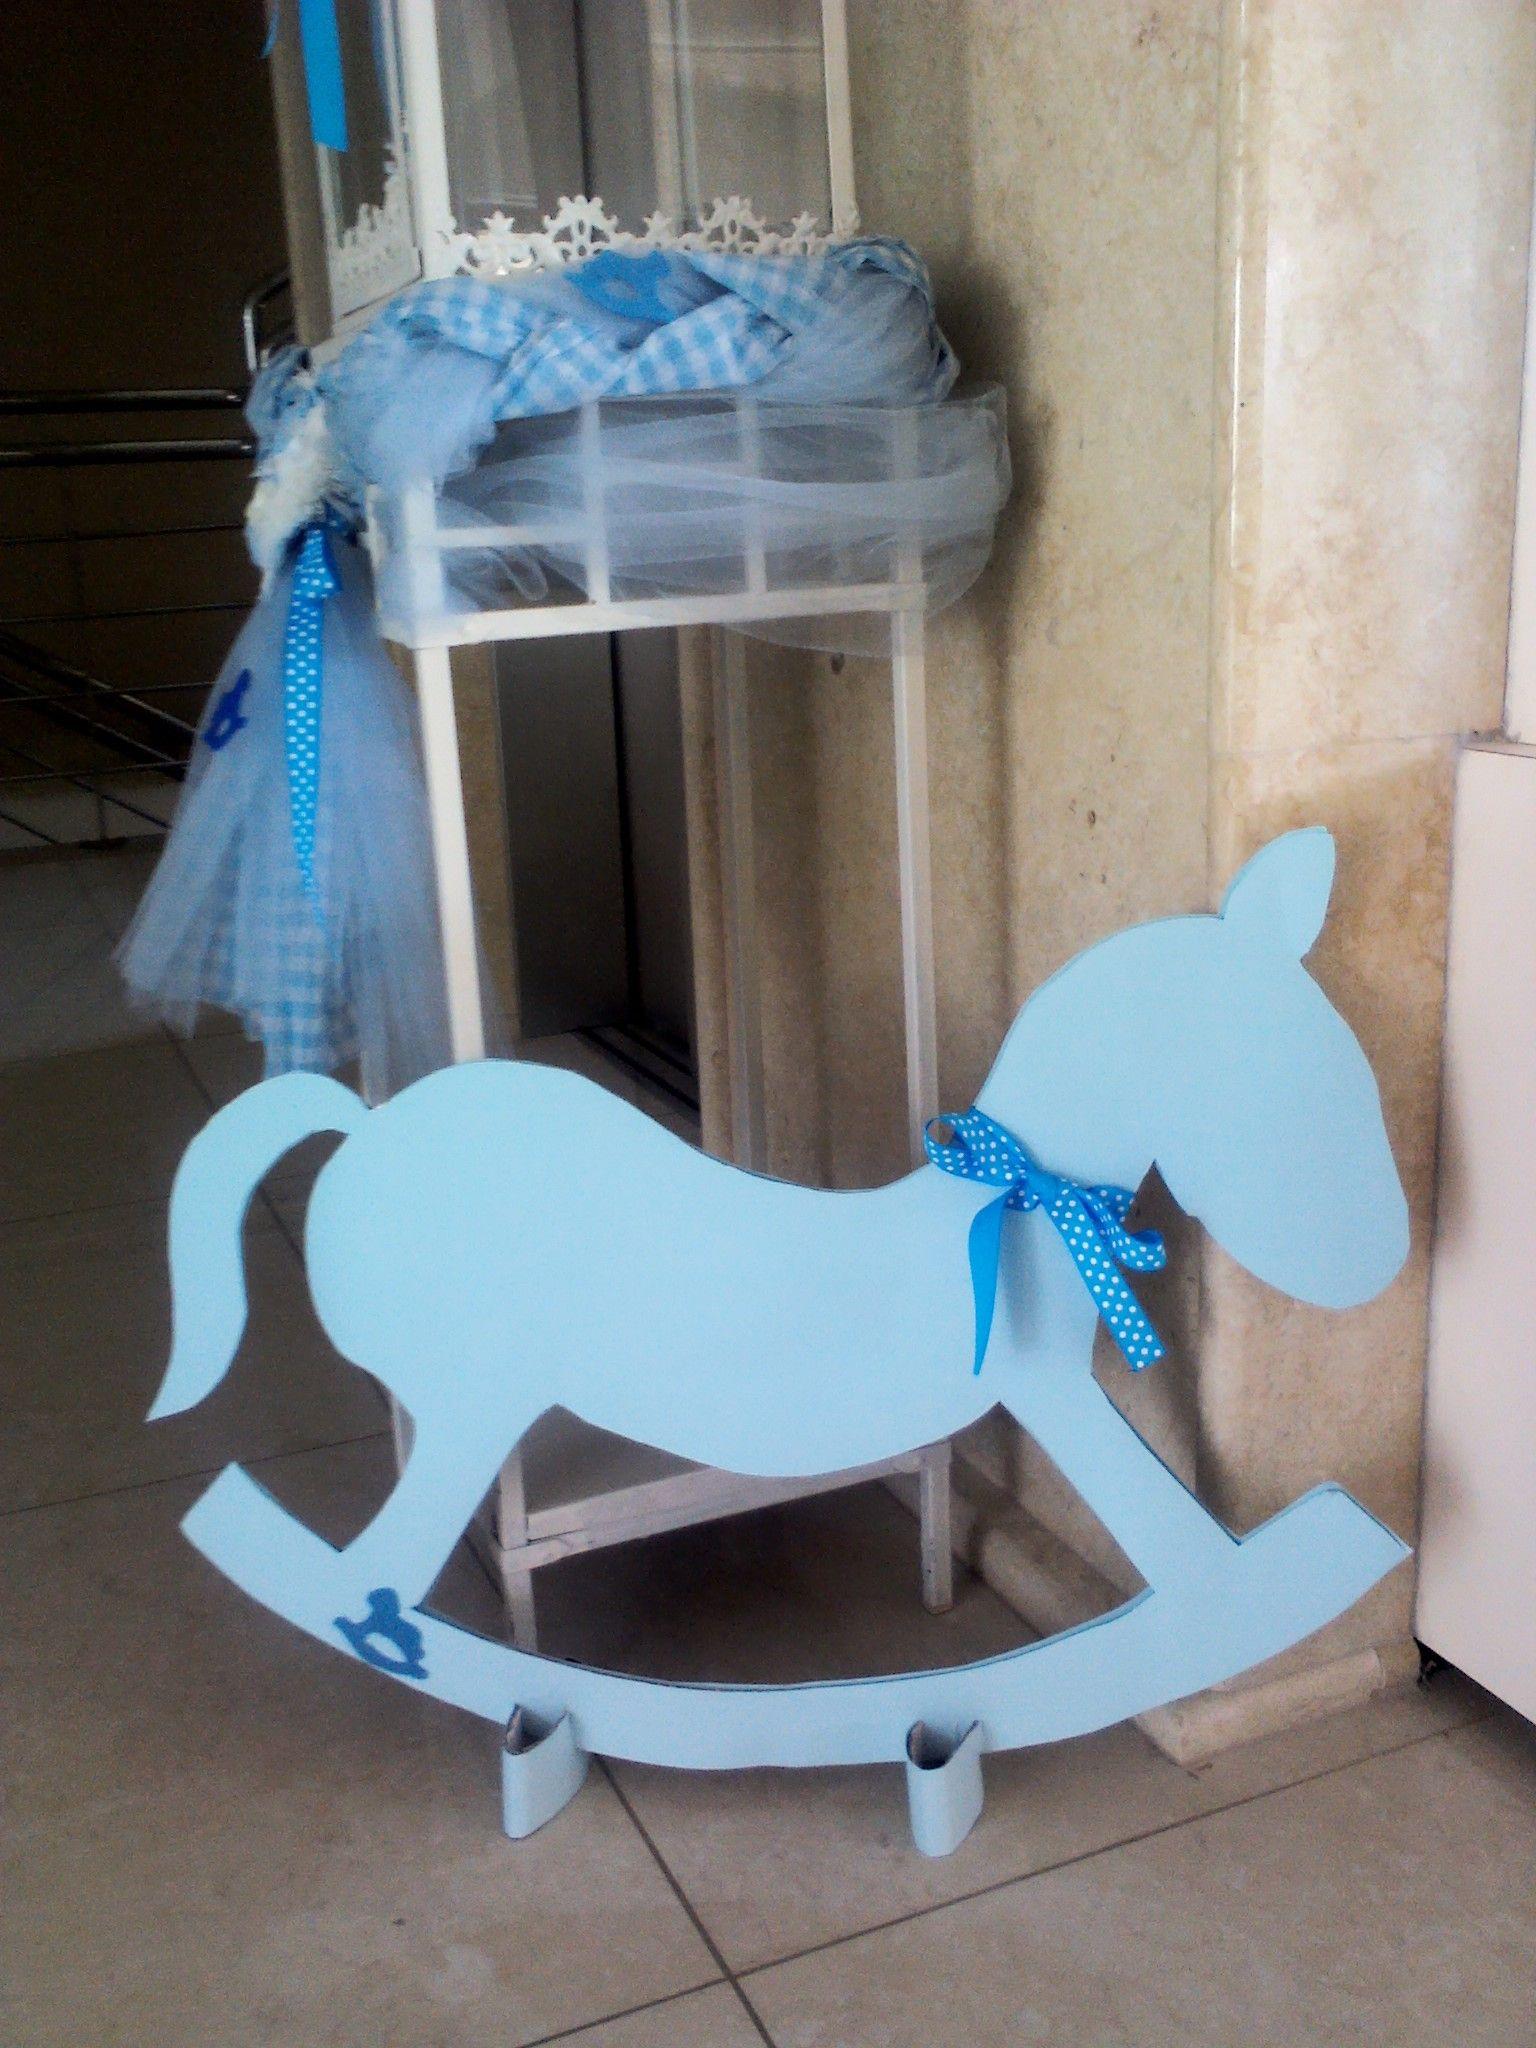 Christening decorations - carousel theme